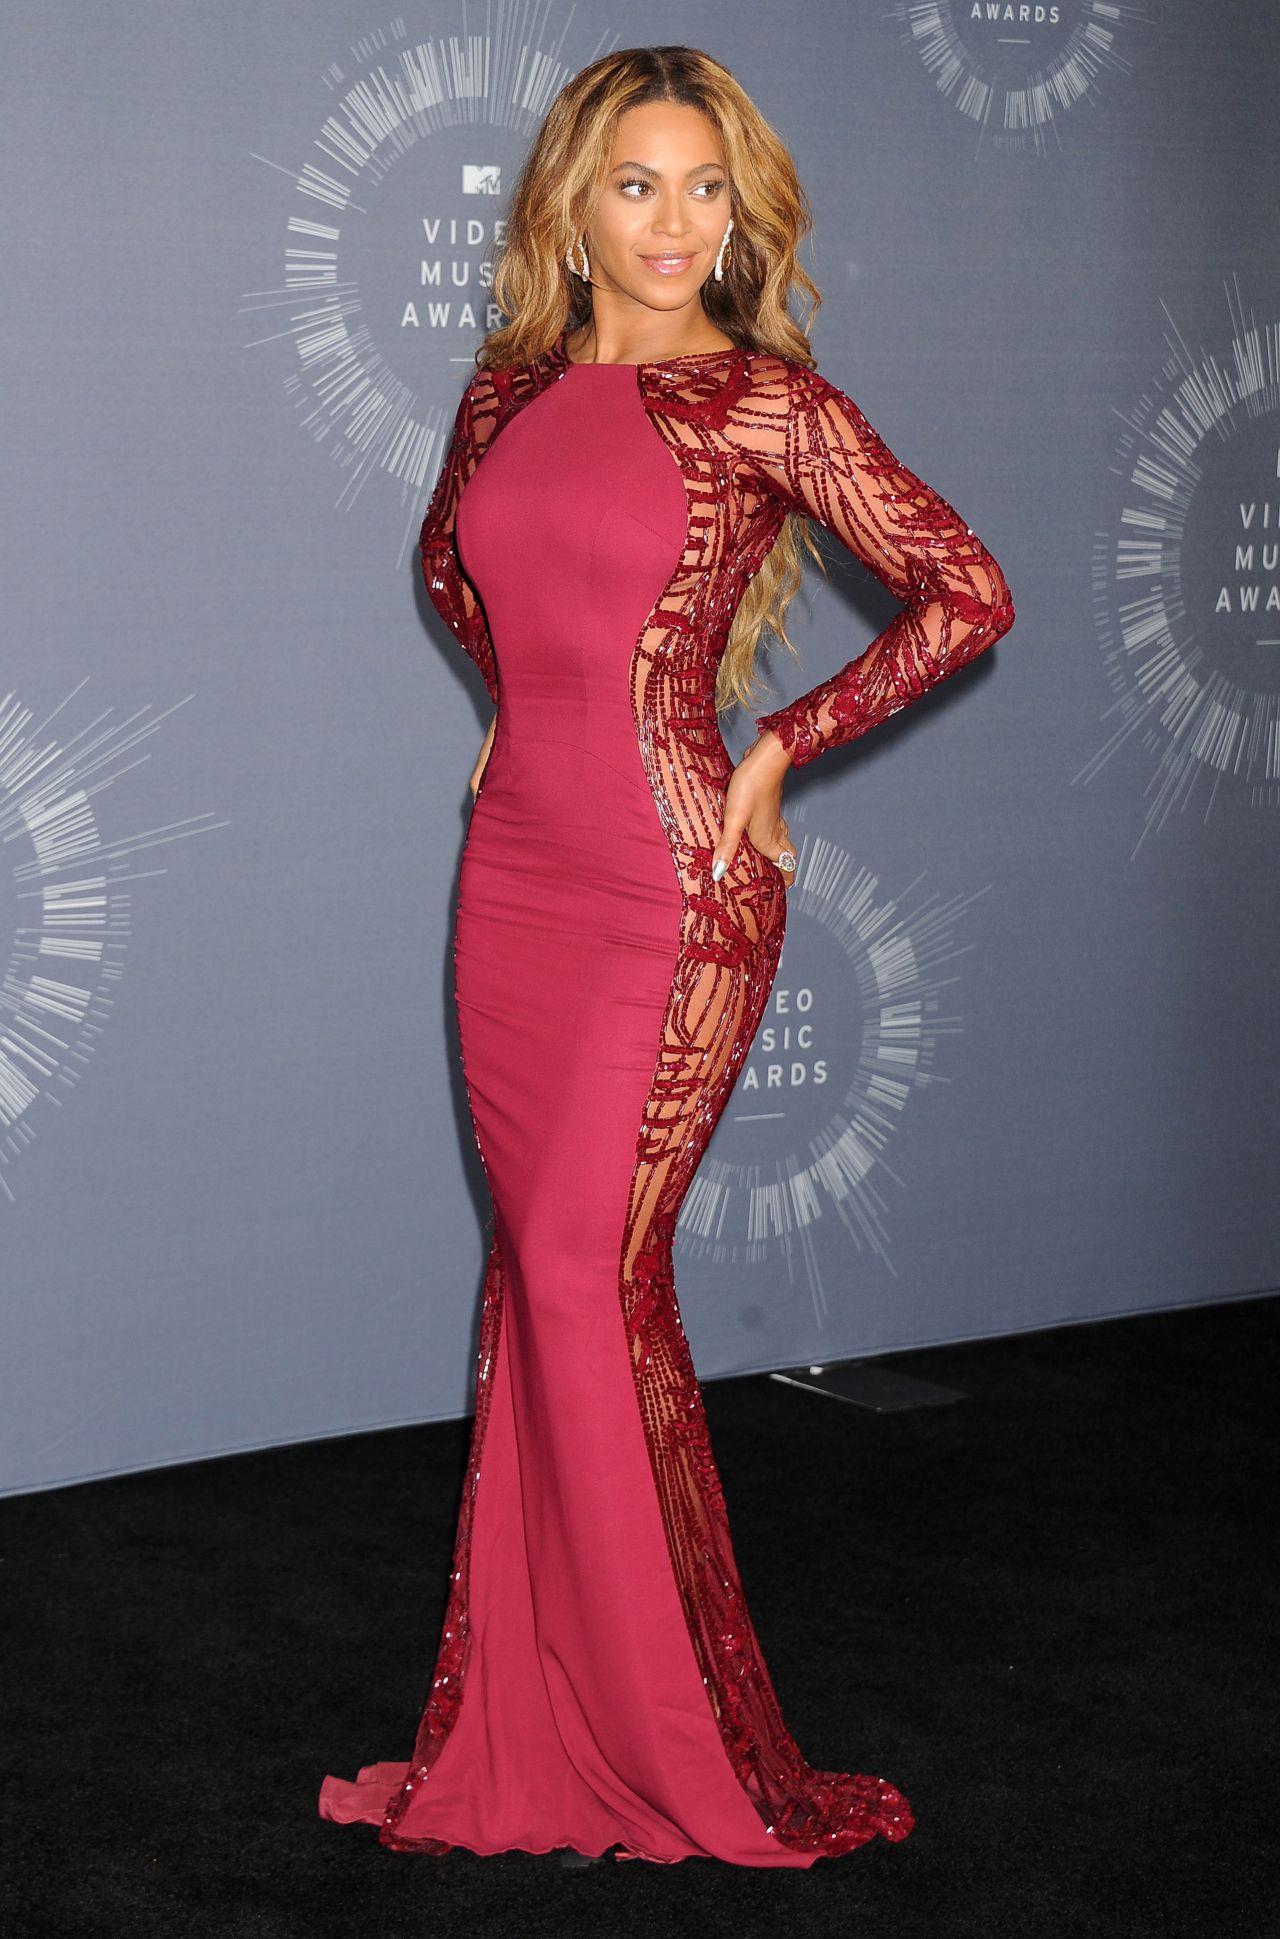 Beyonce 2014 Mtv Video Music Awards Winner